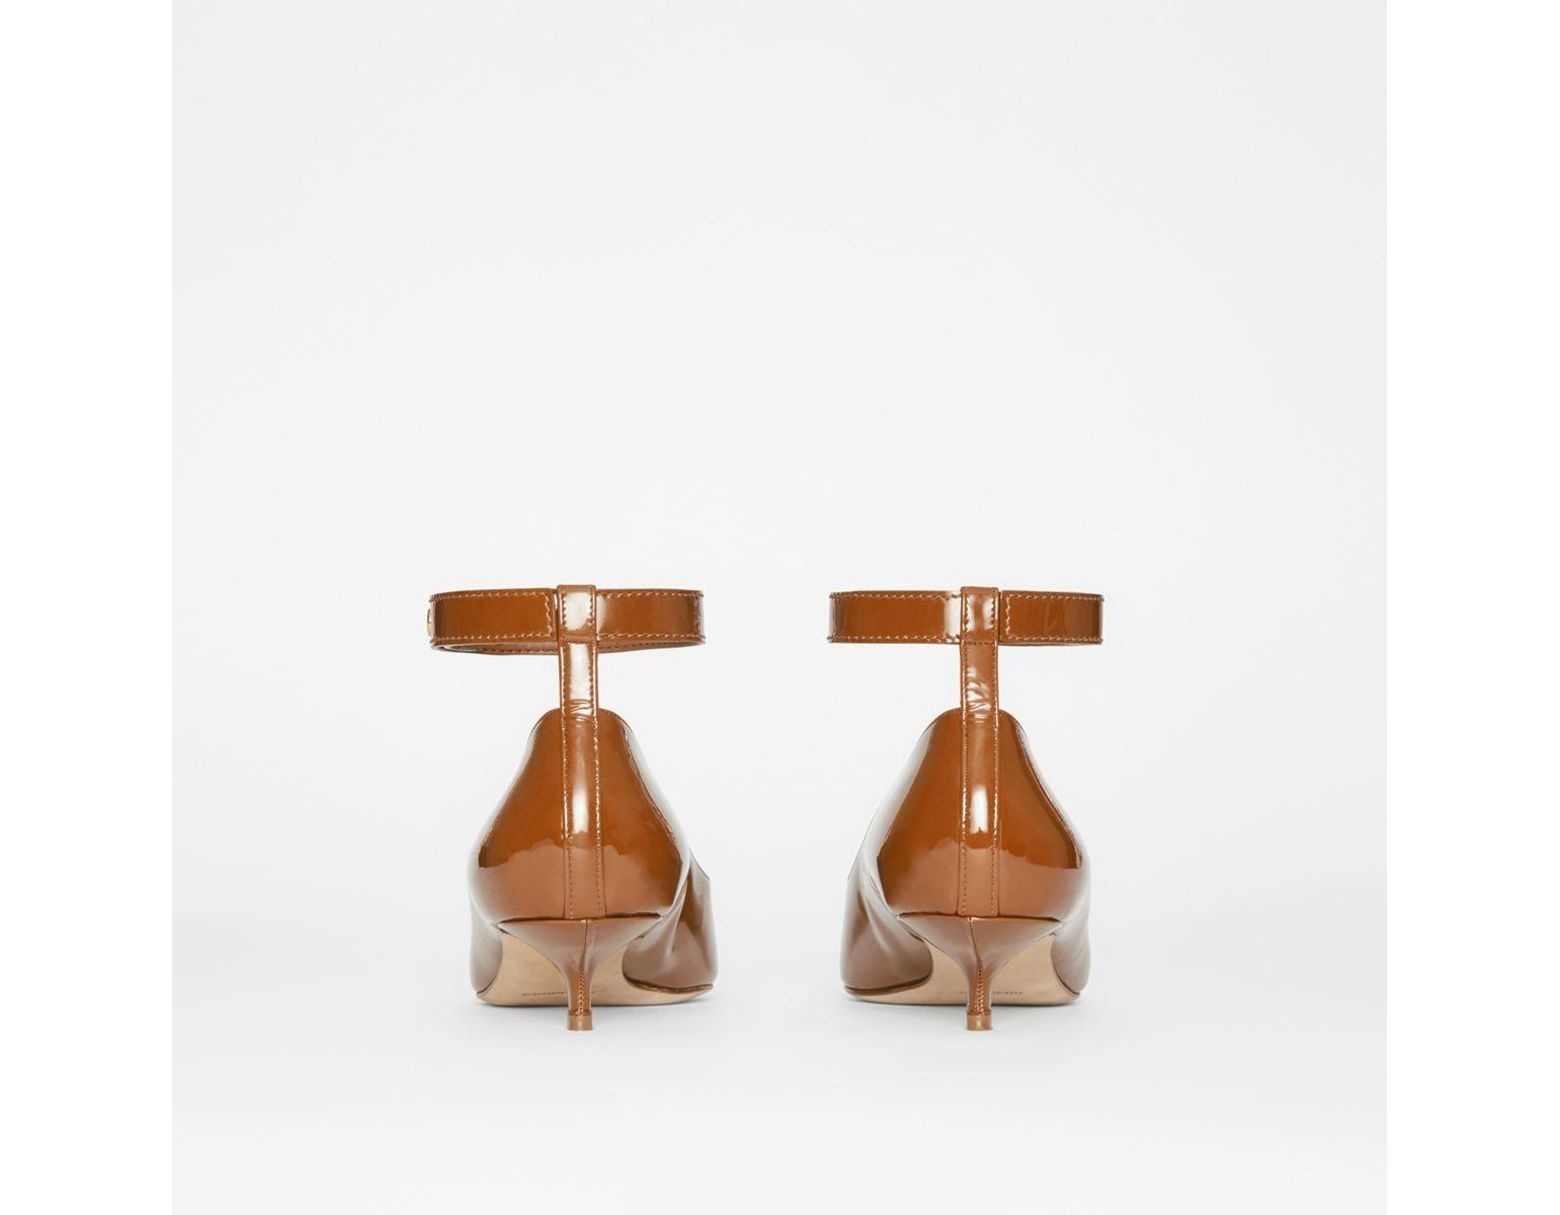 b9b6fe65cc Burberry Patent Leather Peep-toe Kitten-heel Pumps in Brown - Lyst